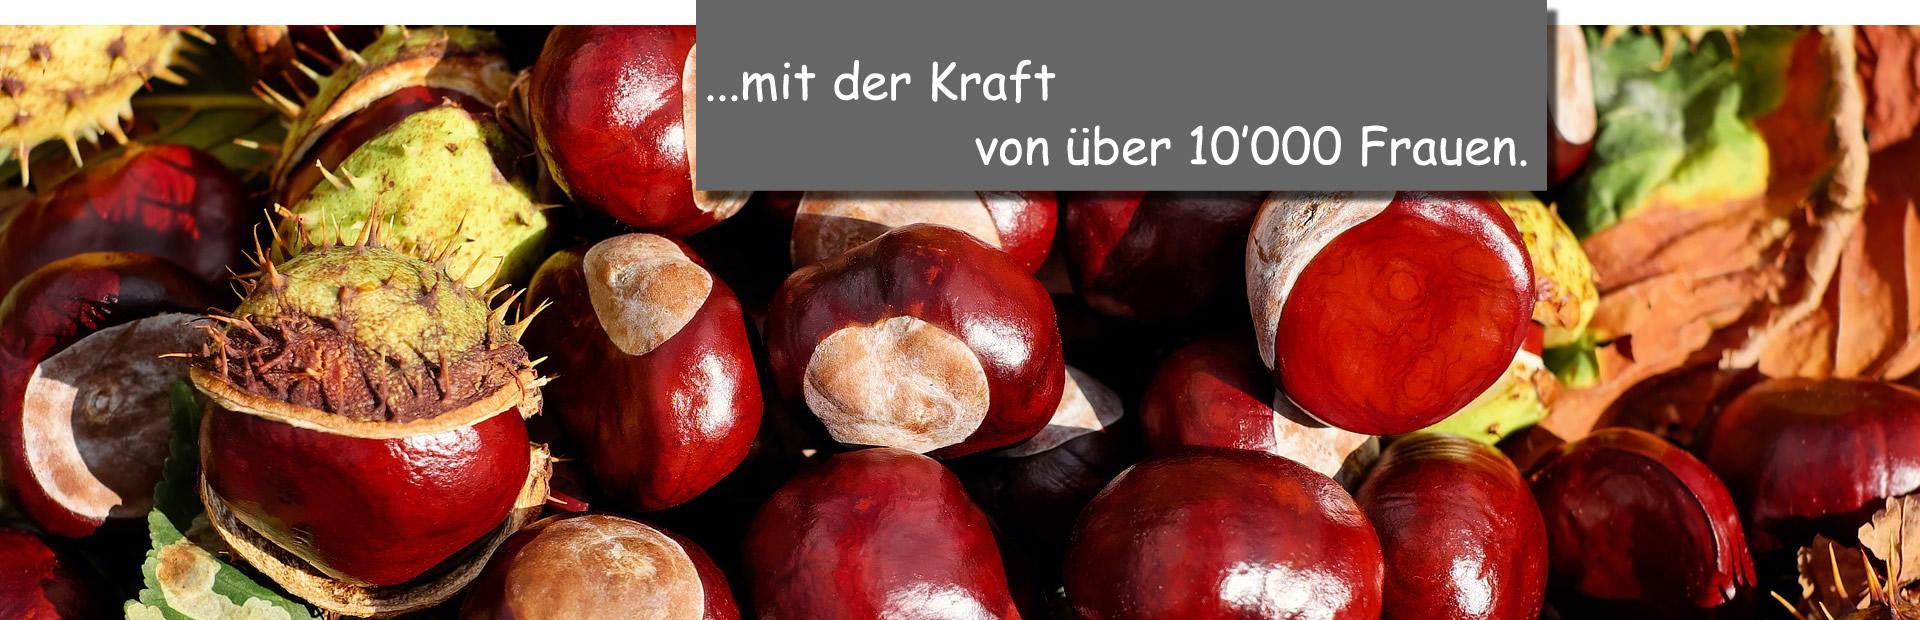 Kastanien_Kraft